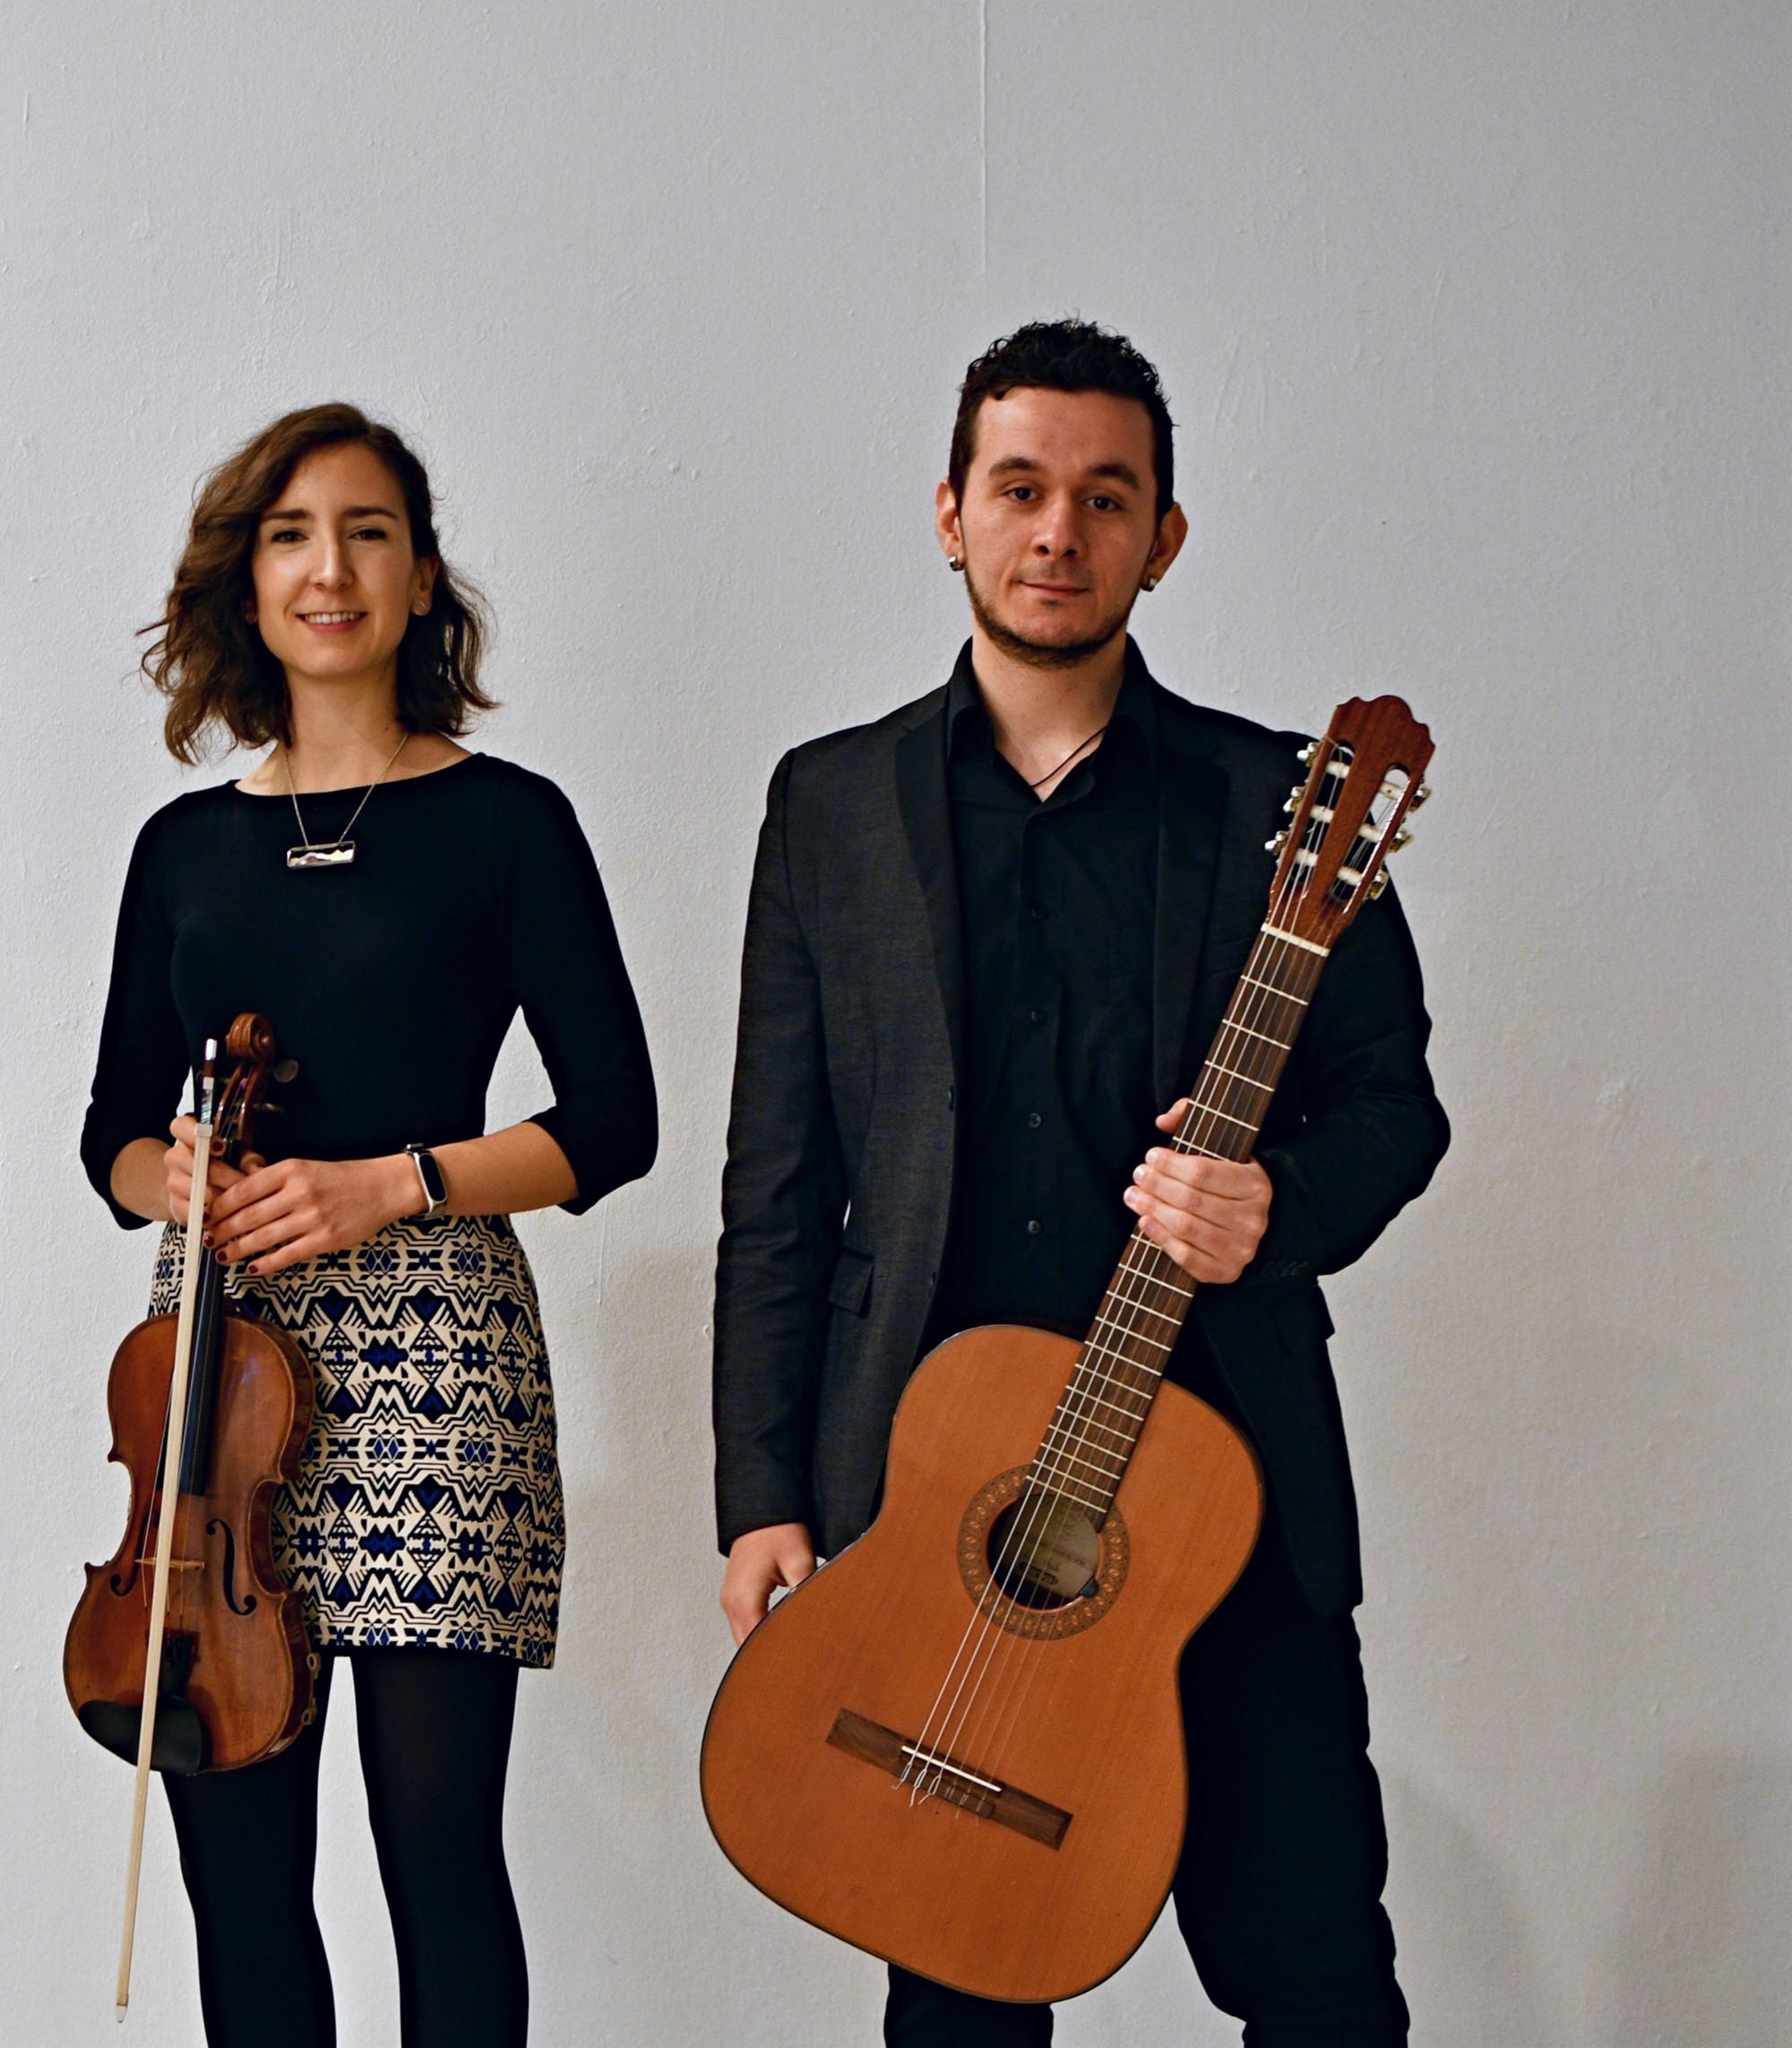 Torhauskonzert Aura Duo mit Iberia